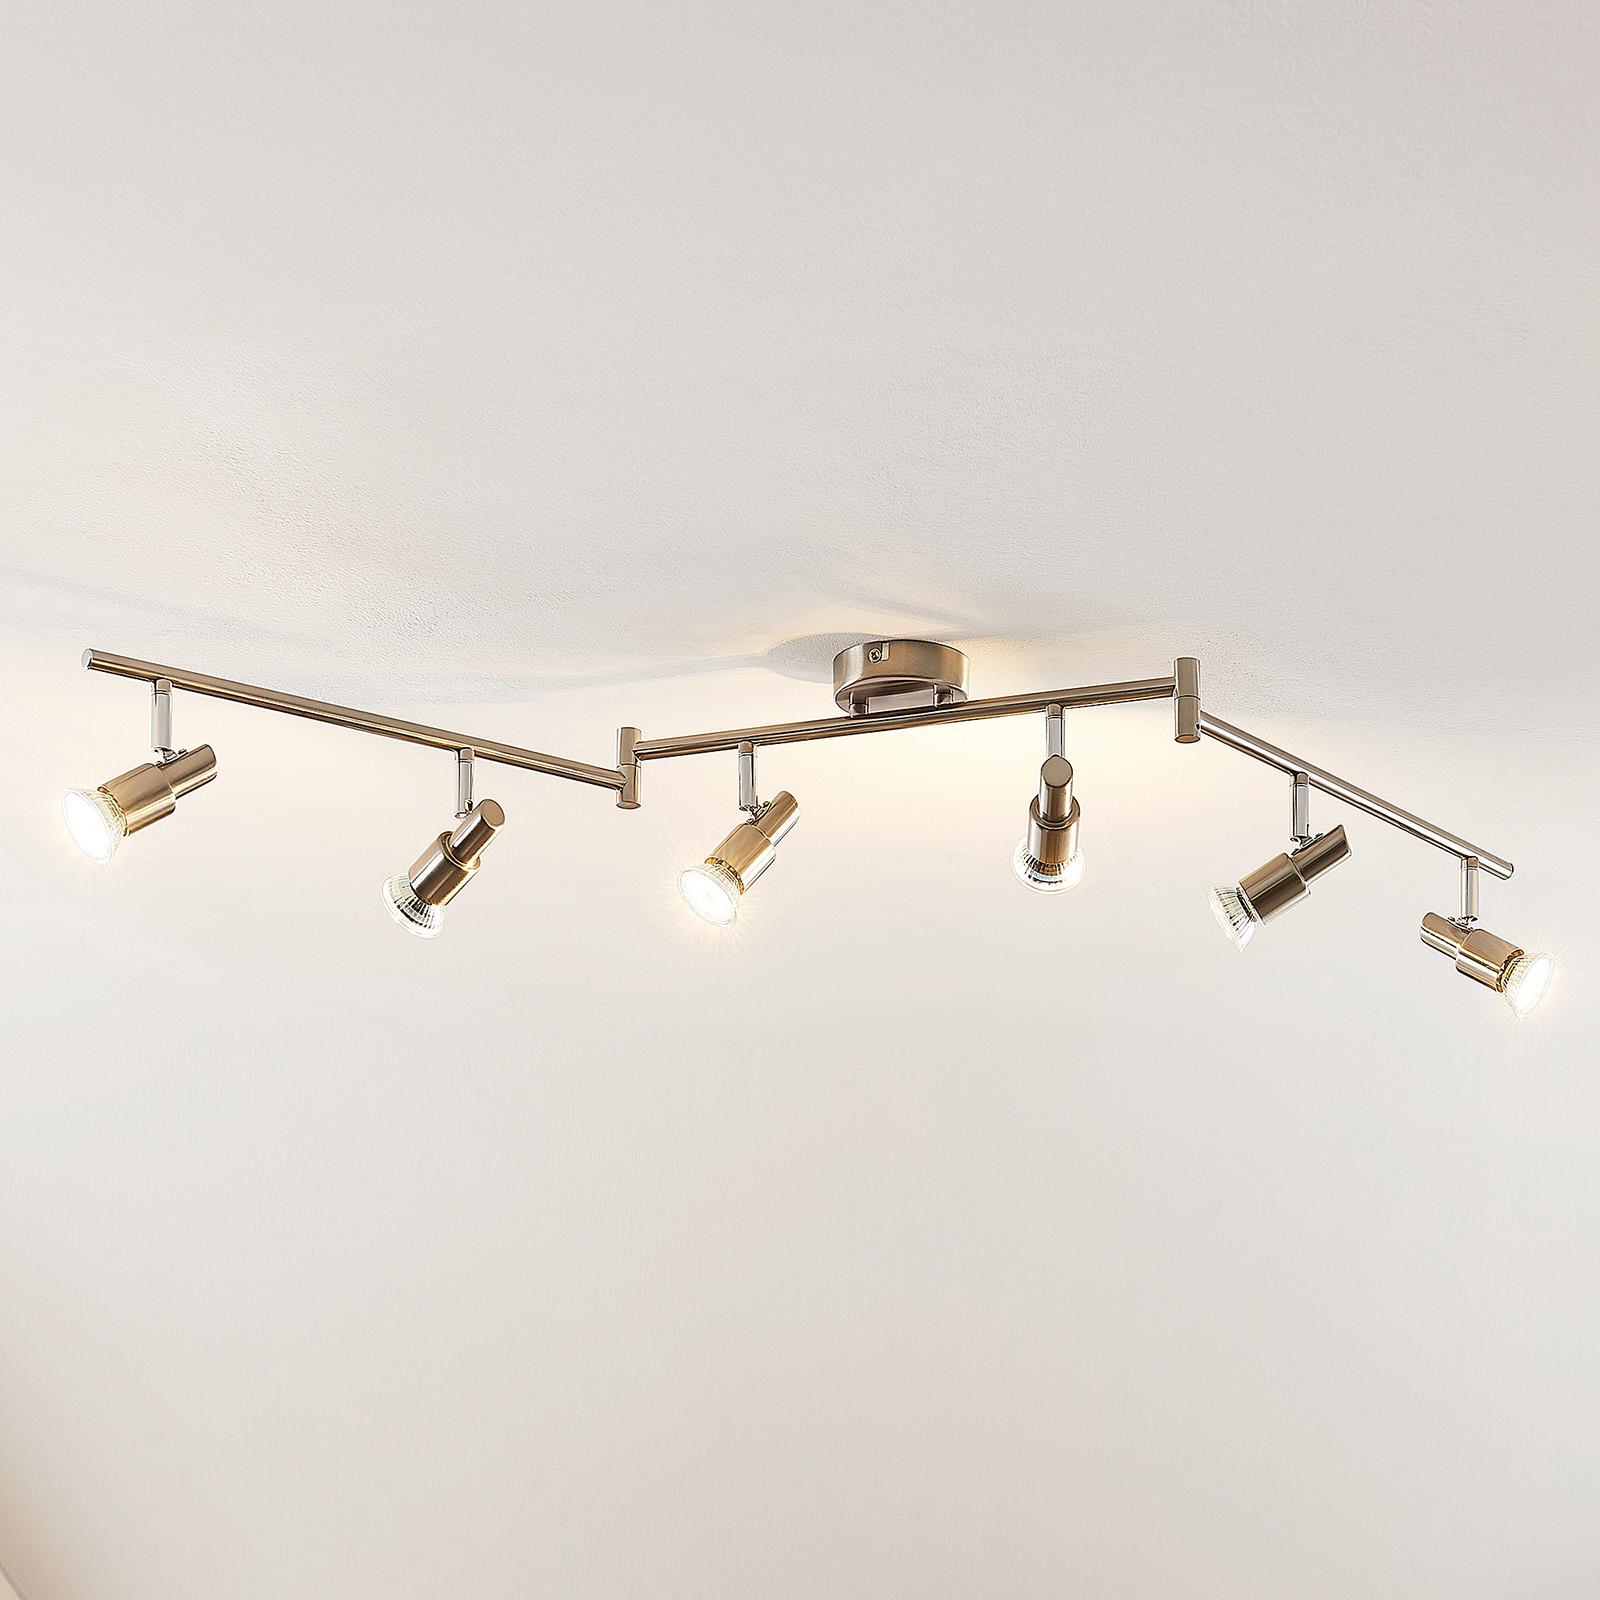 ELC Farida LED-Deckenlampe, nickel, 6-flammig